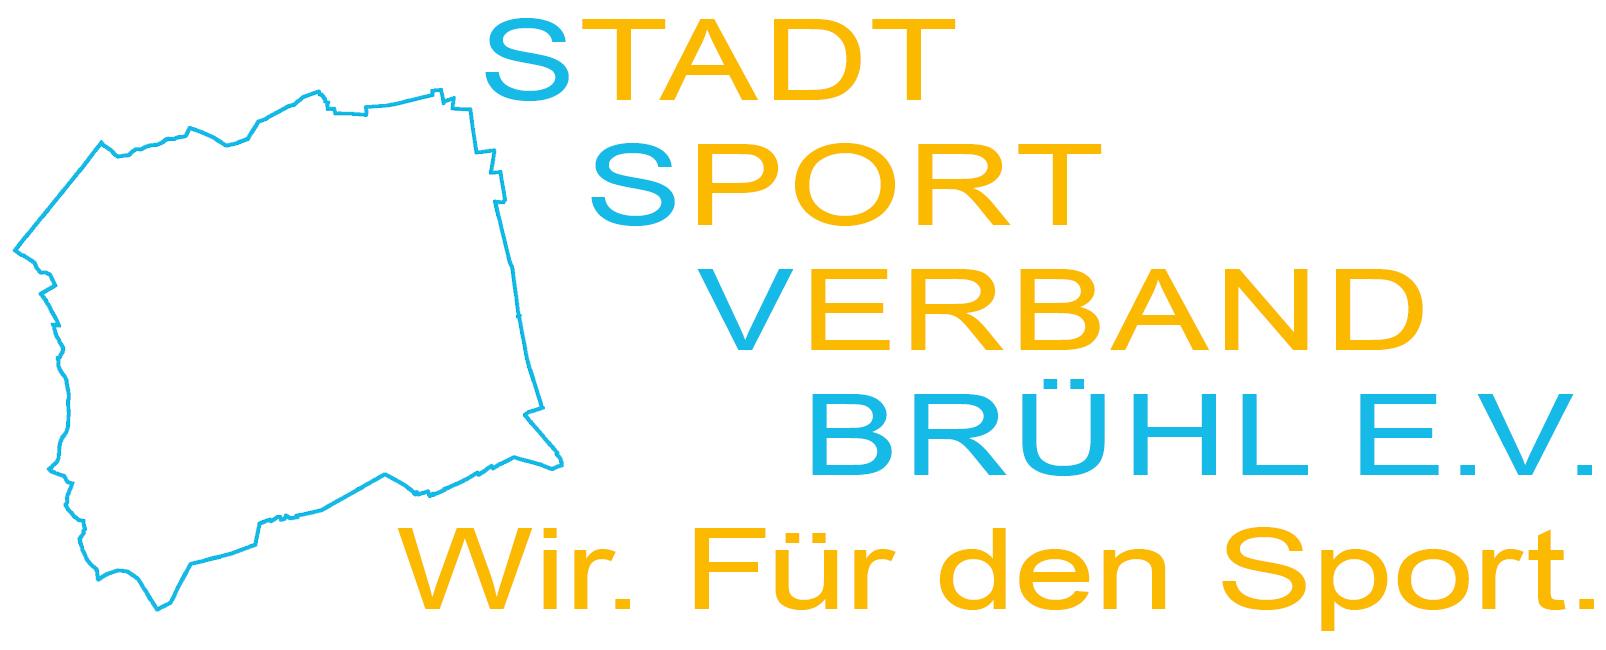 SSV Brühl